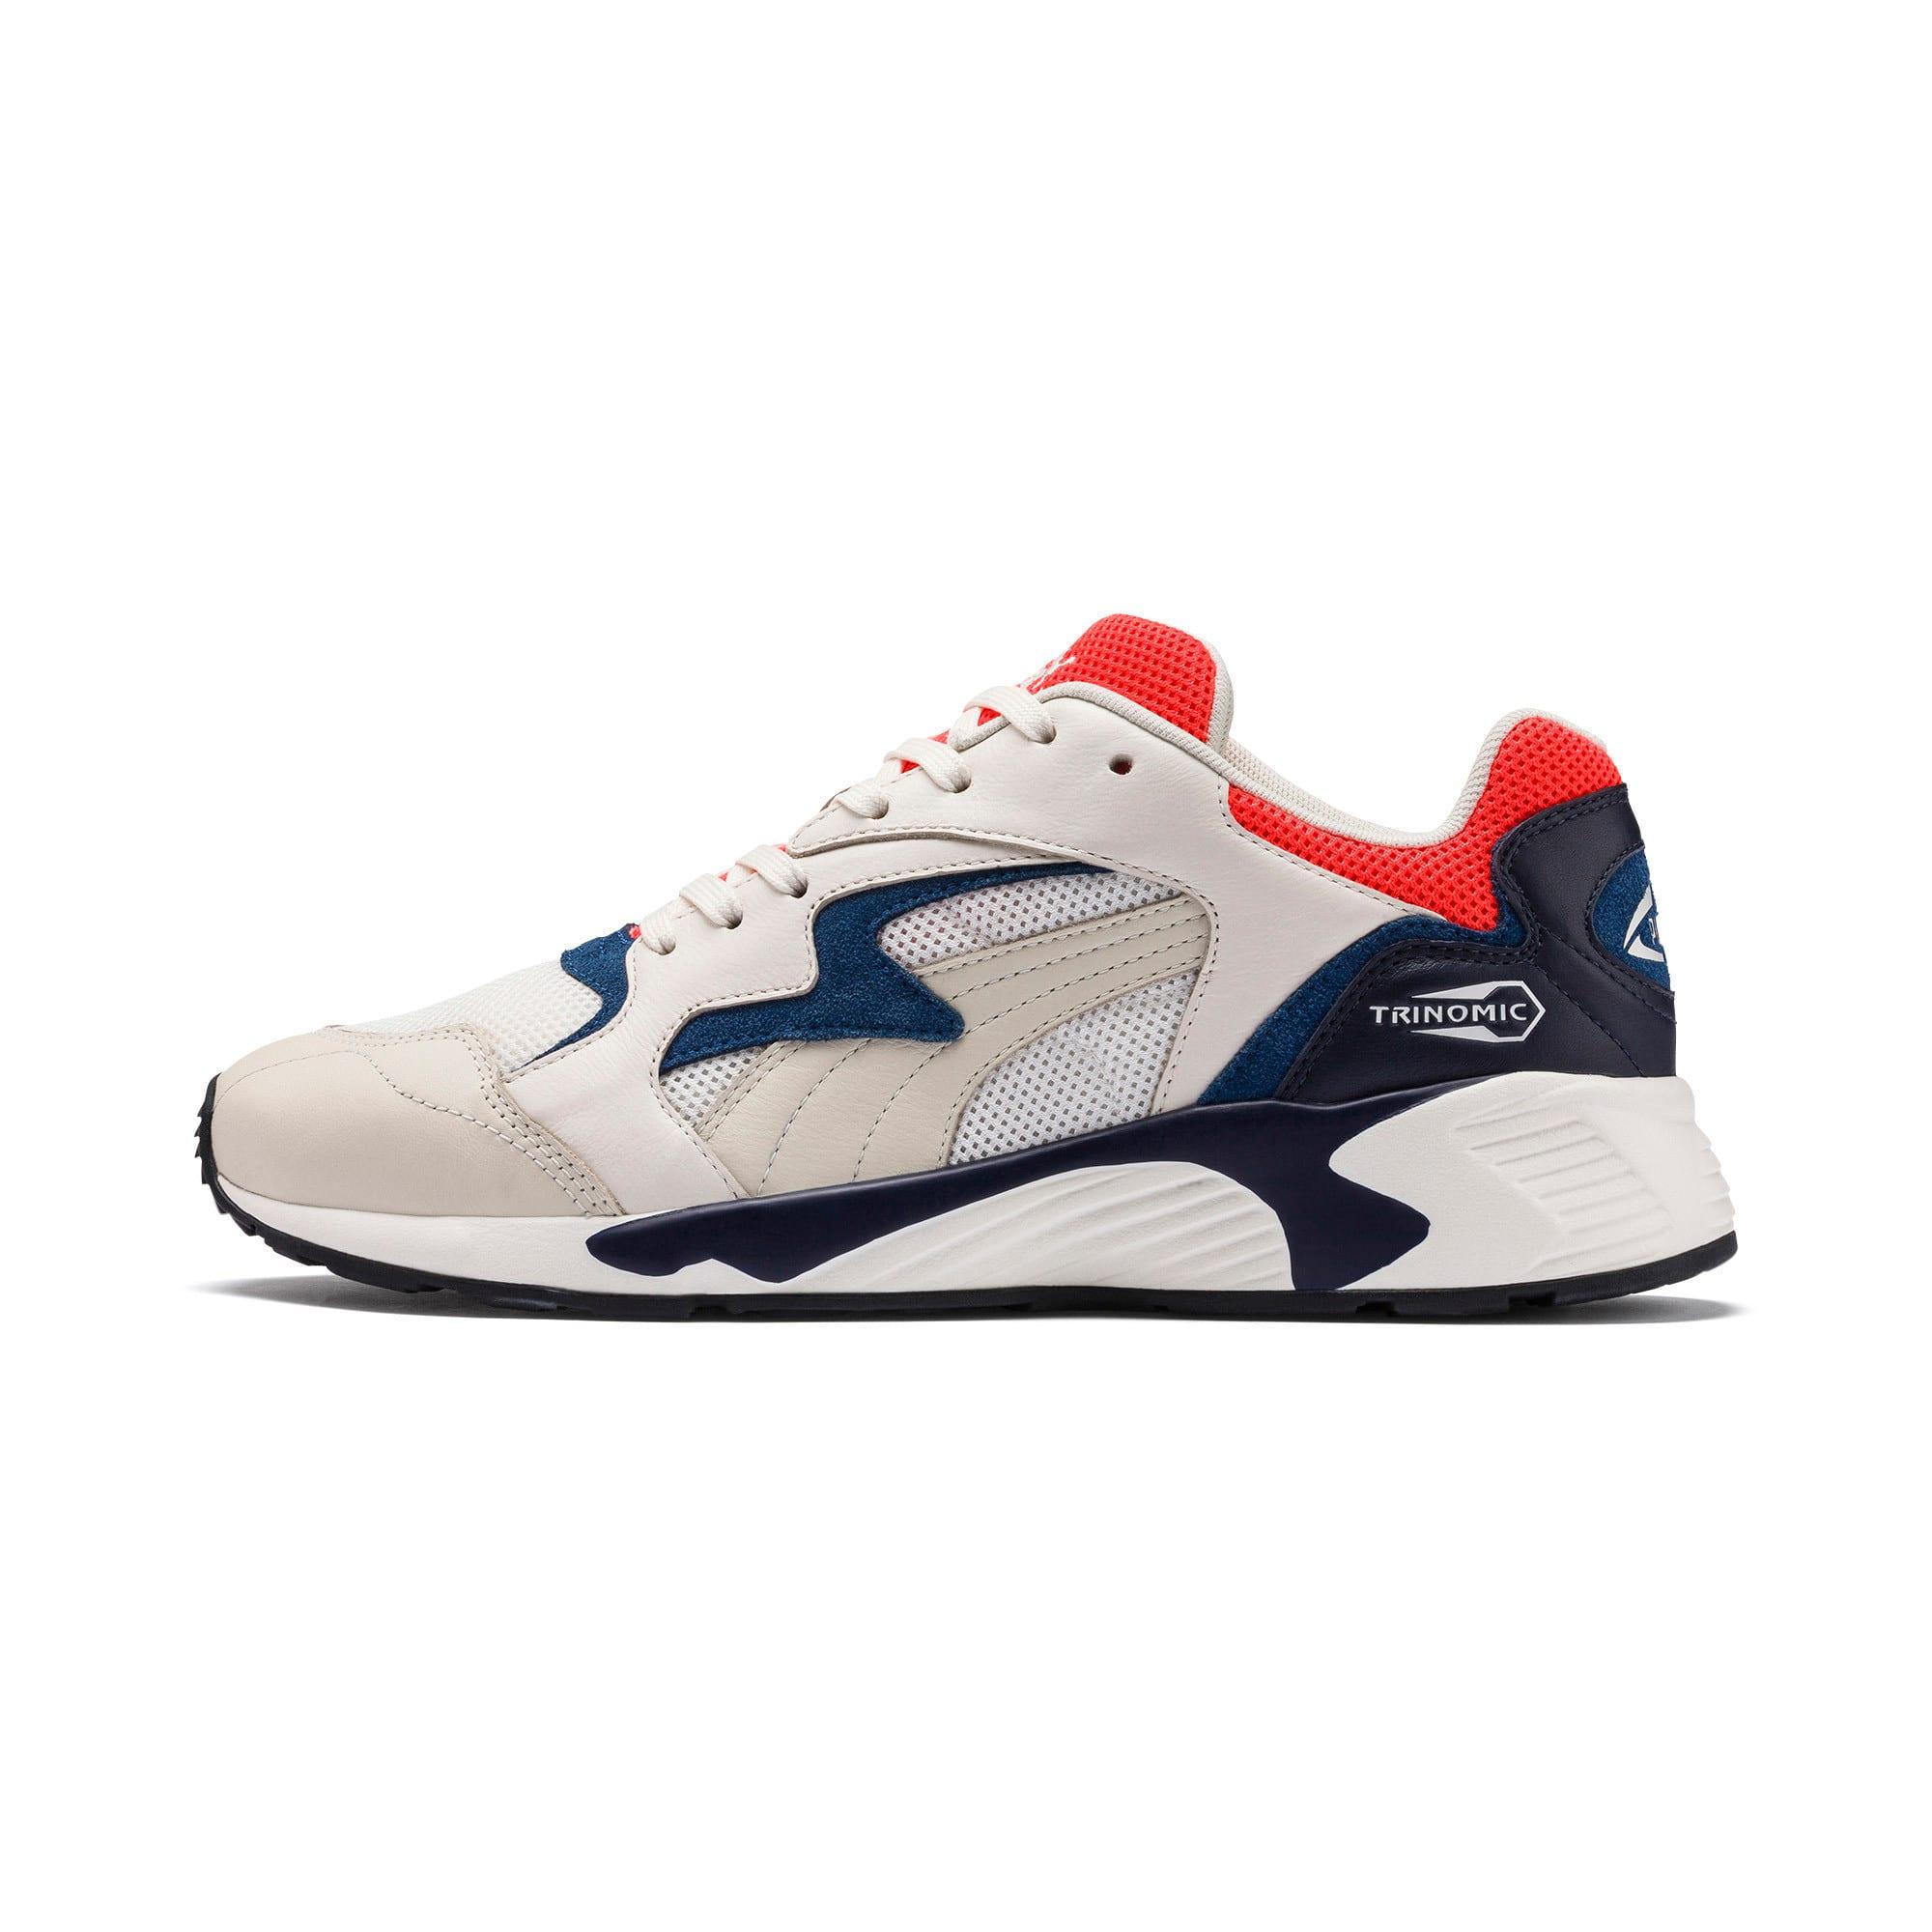 Thumbnail 1 of Prevail Classic Sneakers, Whisper White-Nrgy Red, medium